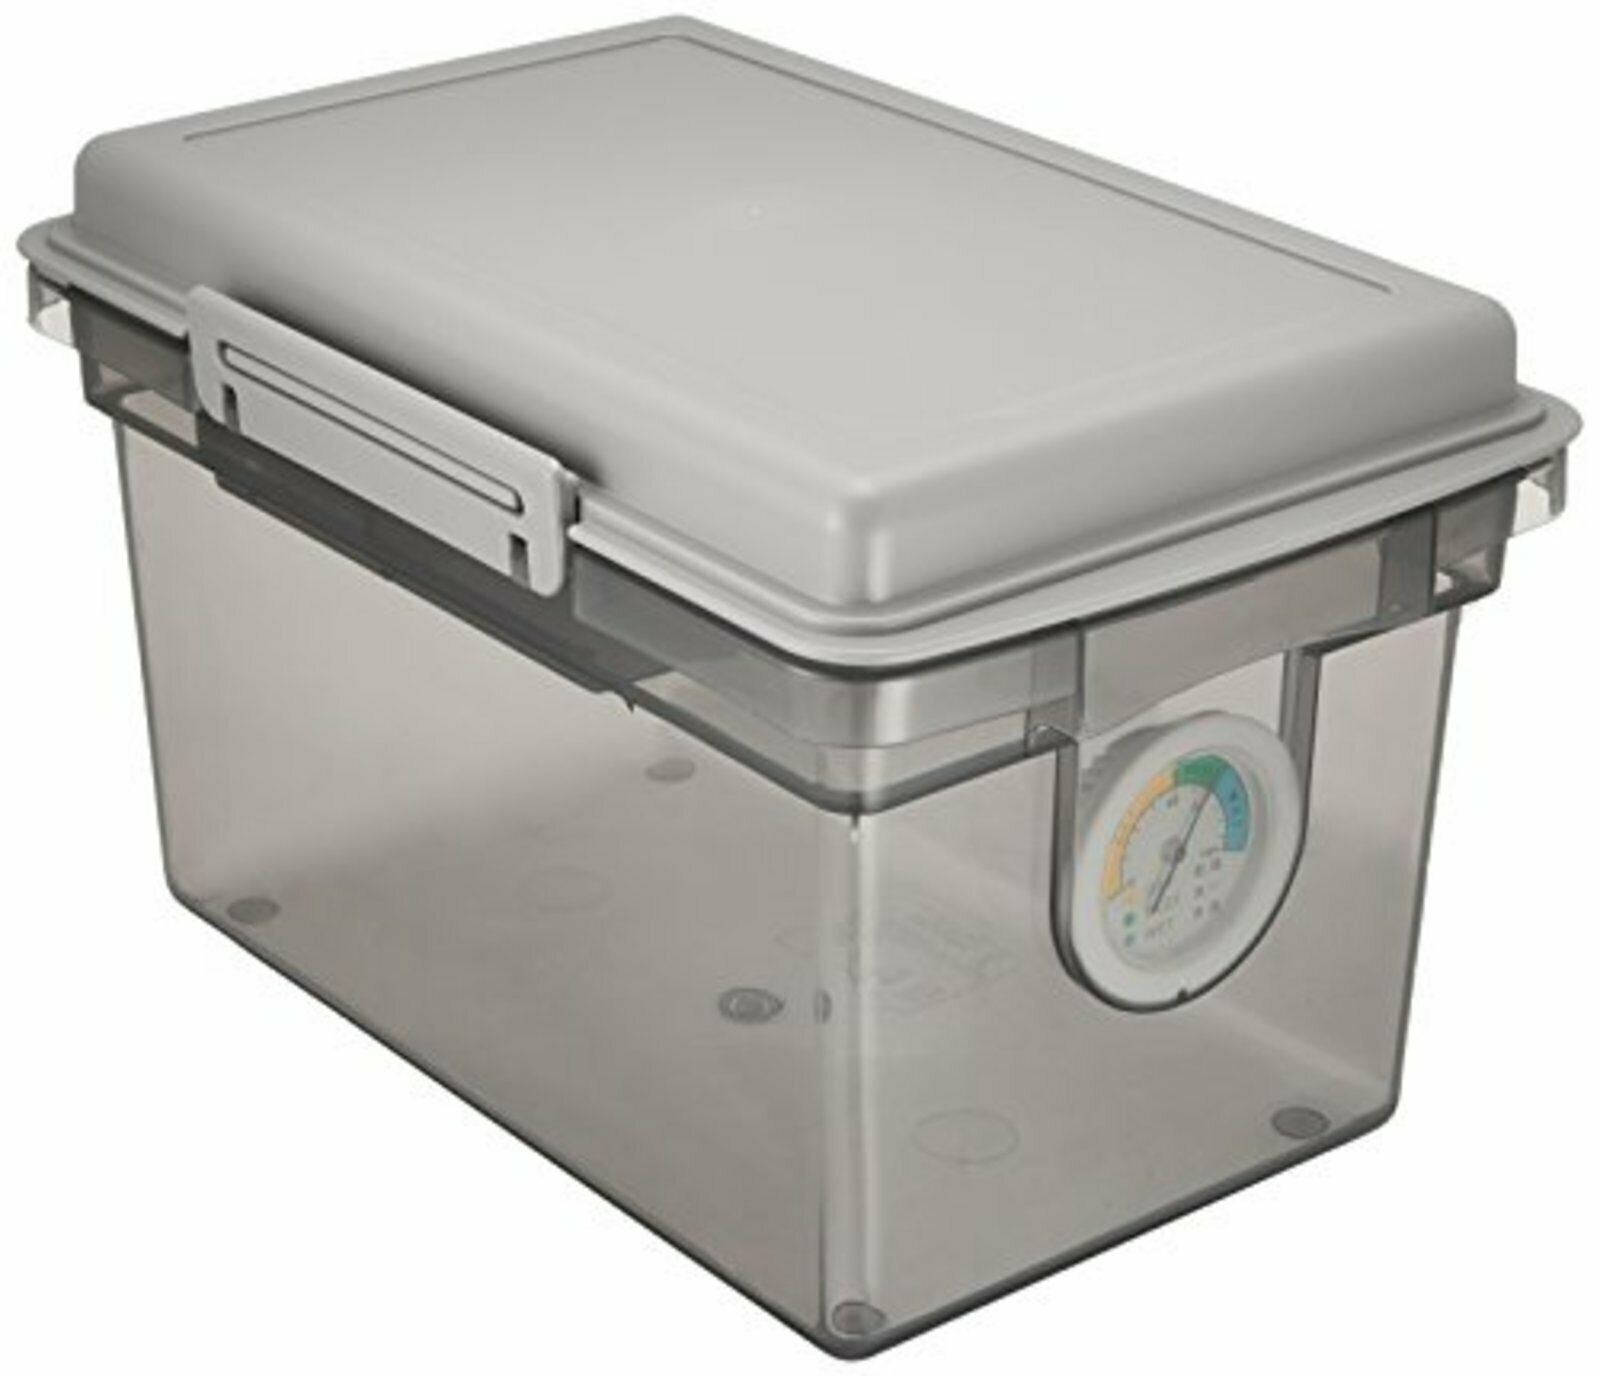 Royalty Dry Box 8l Capacity Gray Db-8l-n Camera storage 8L F/S w/Tracking# Japan